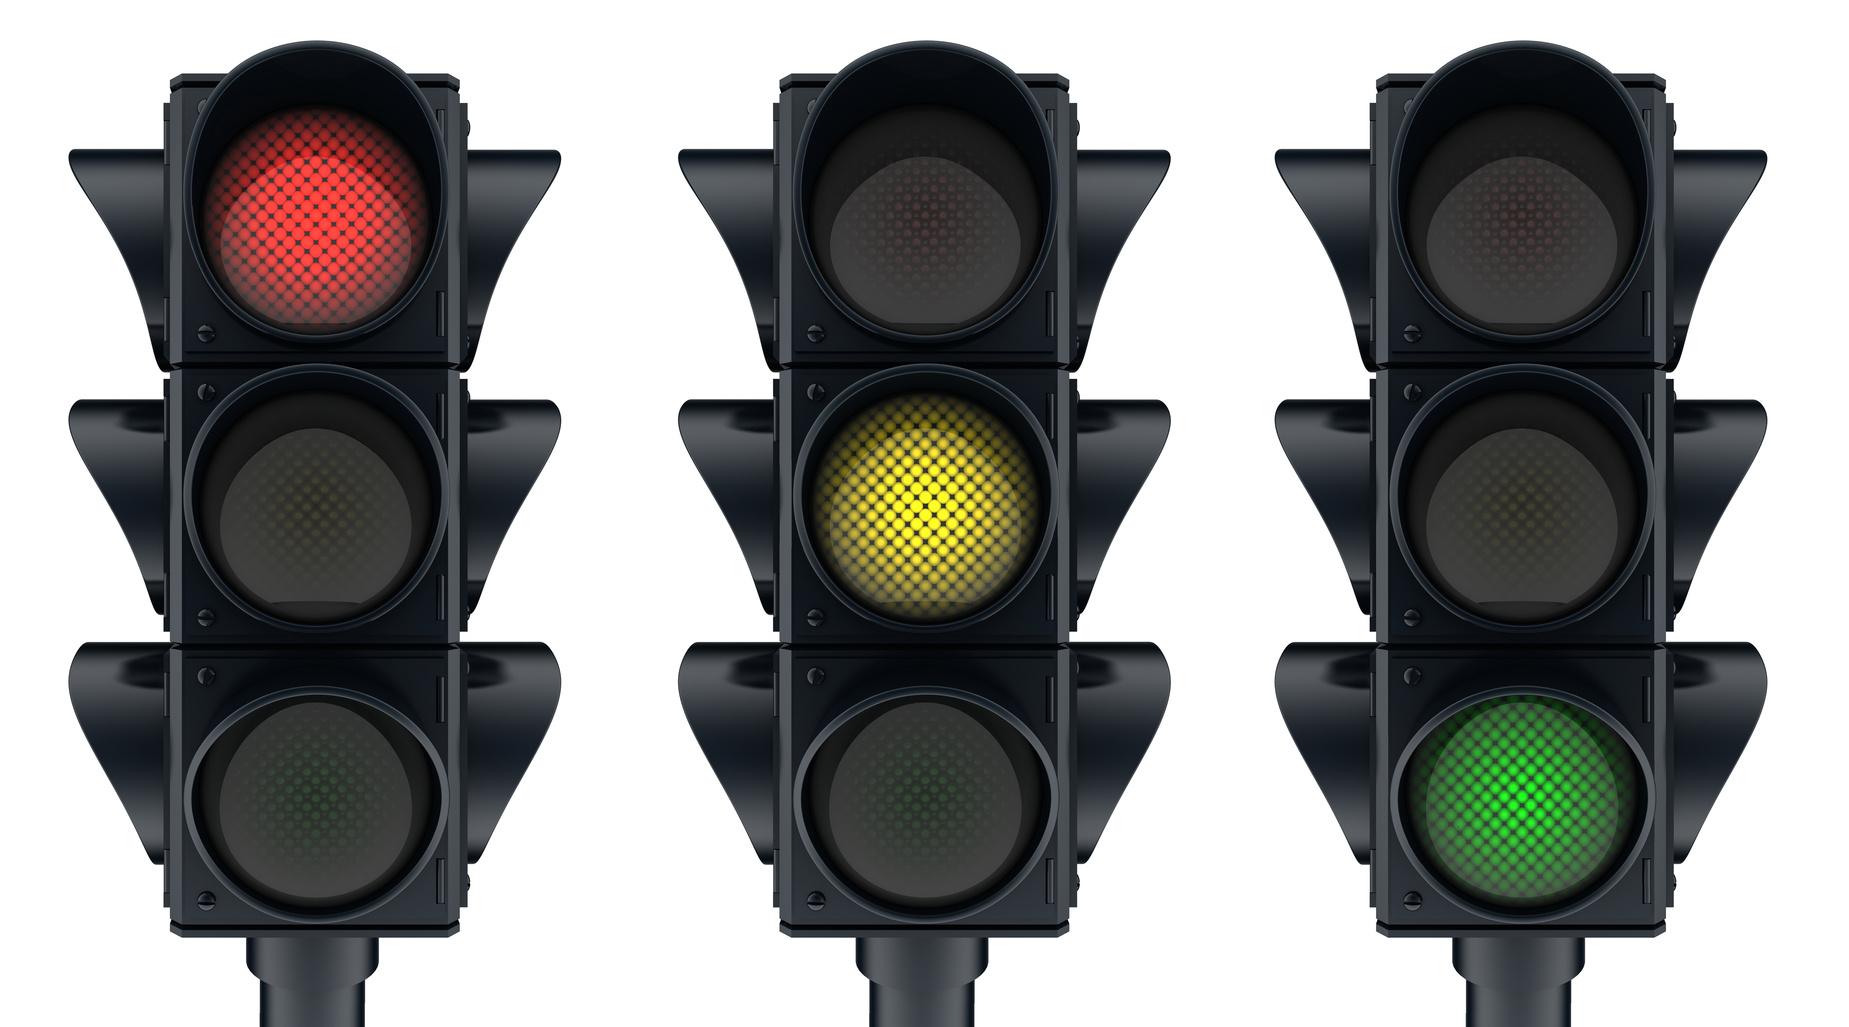 Traffic Lights System for managing interruptions at work